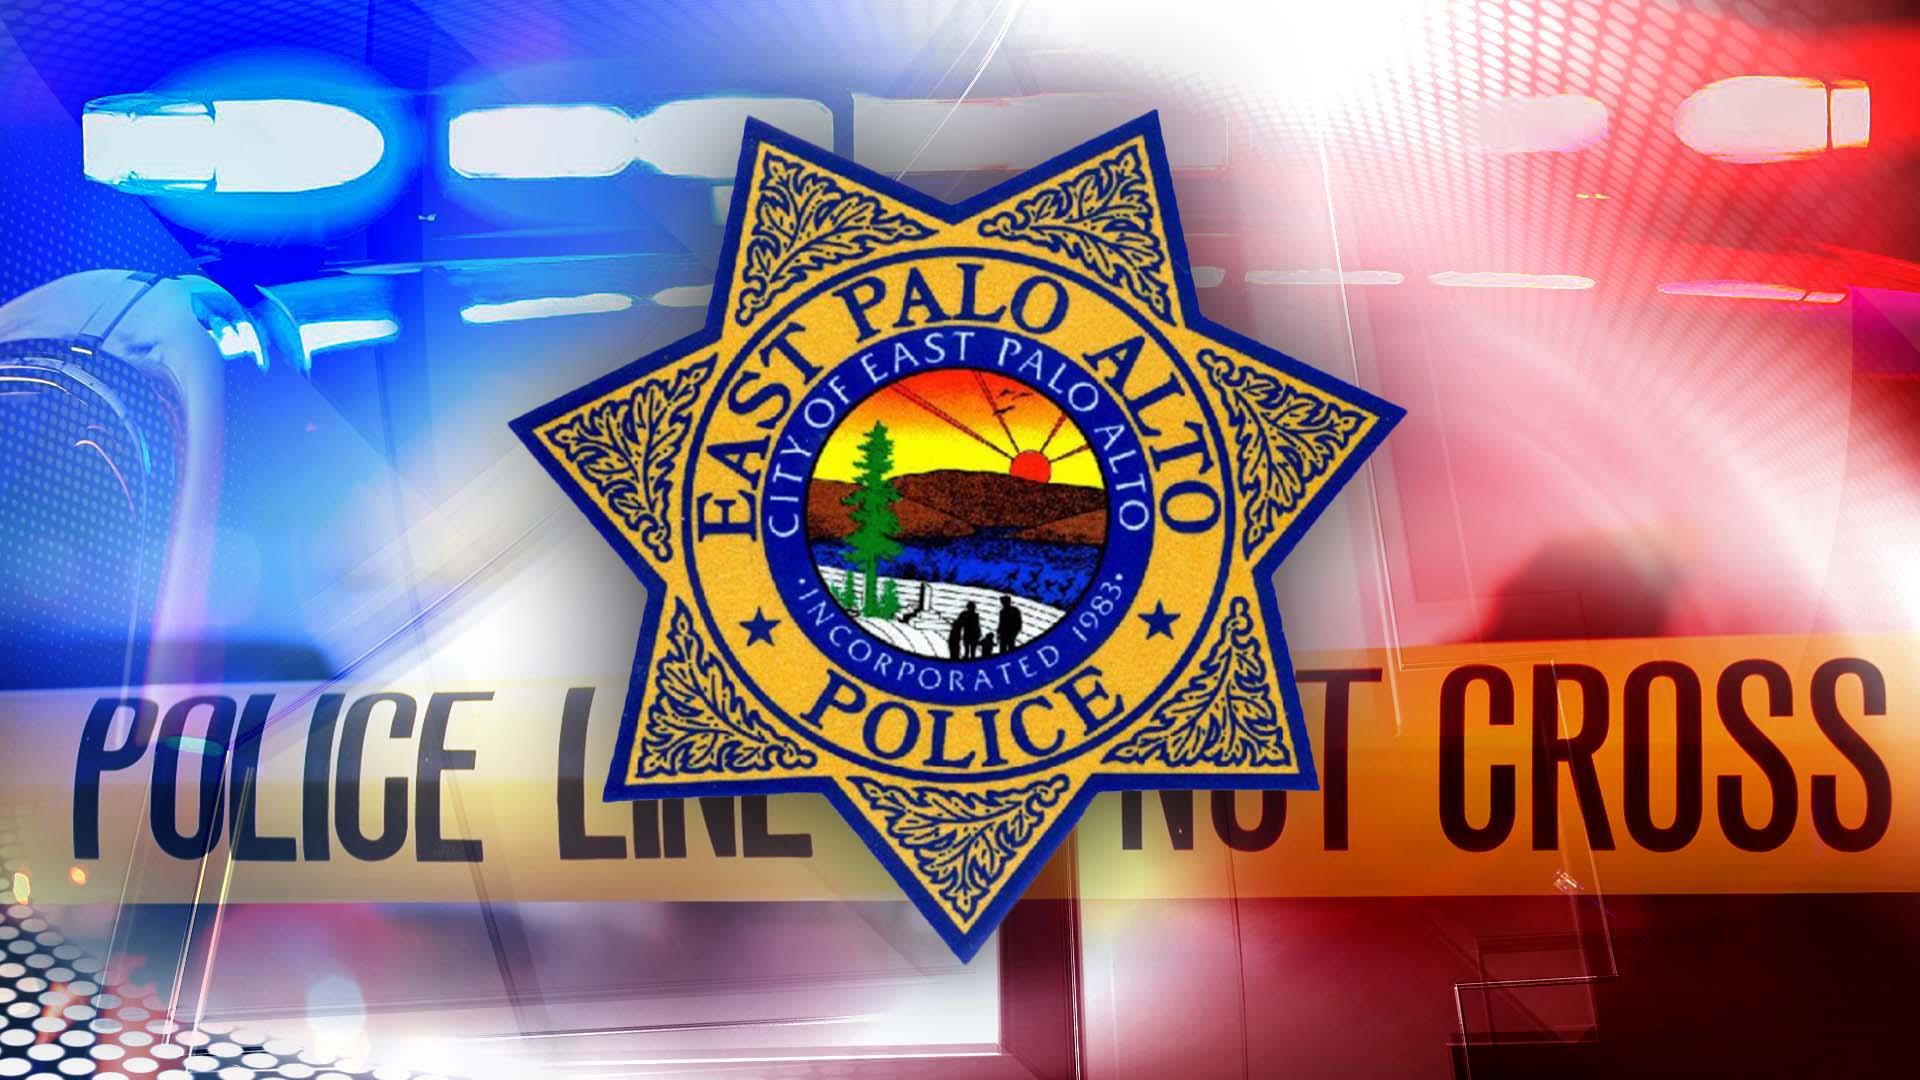 FS Police East Palo Alto_1559774589612.jpg.jpg